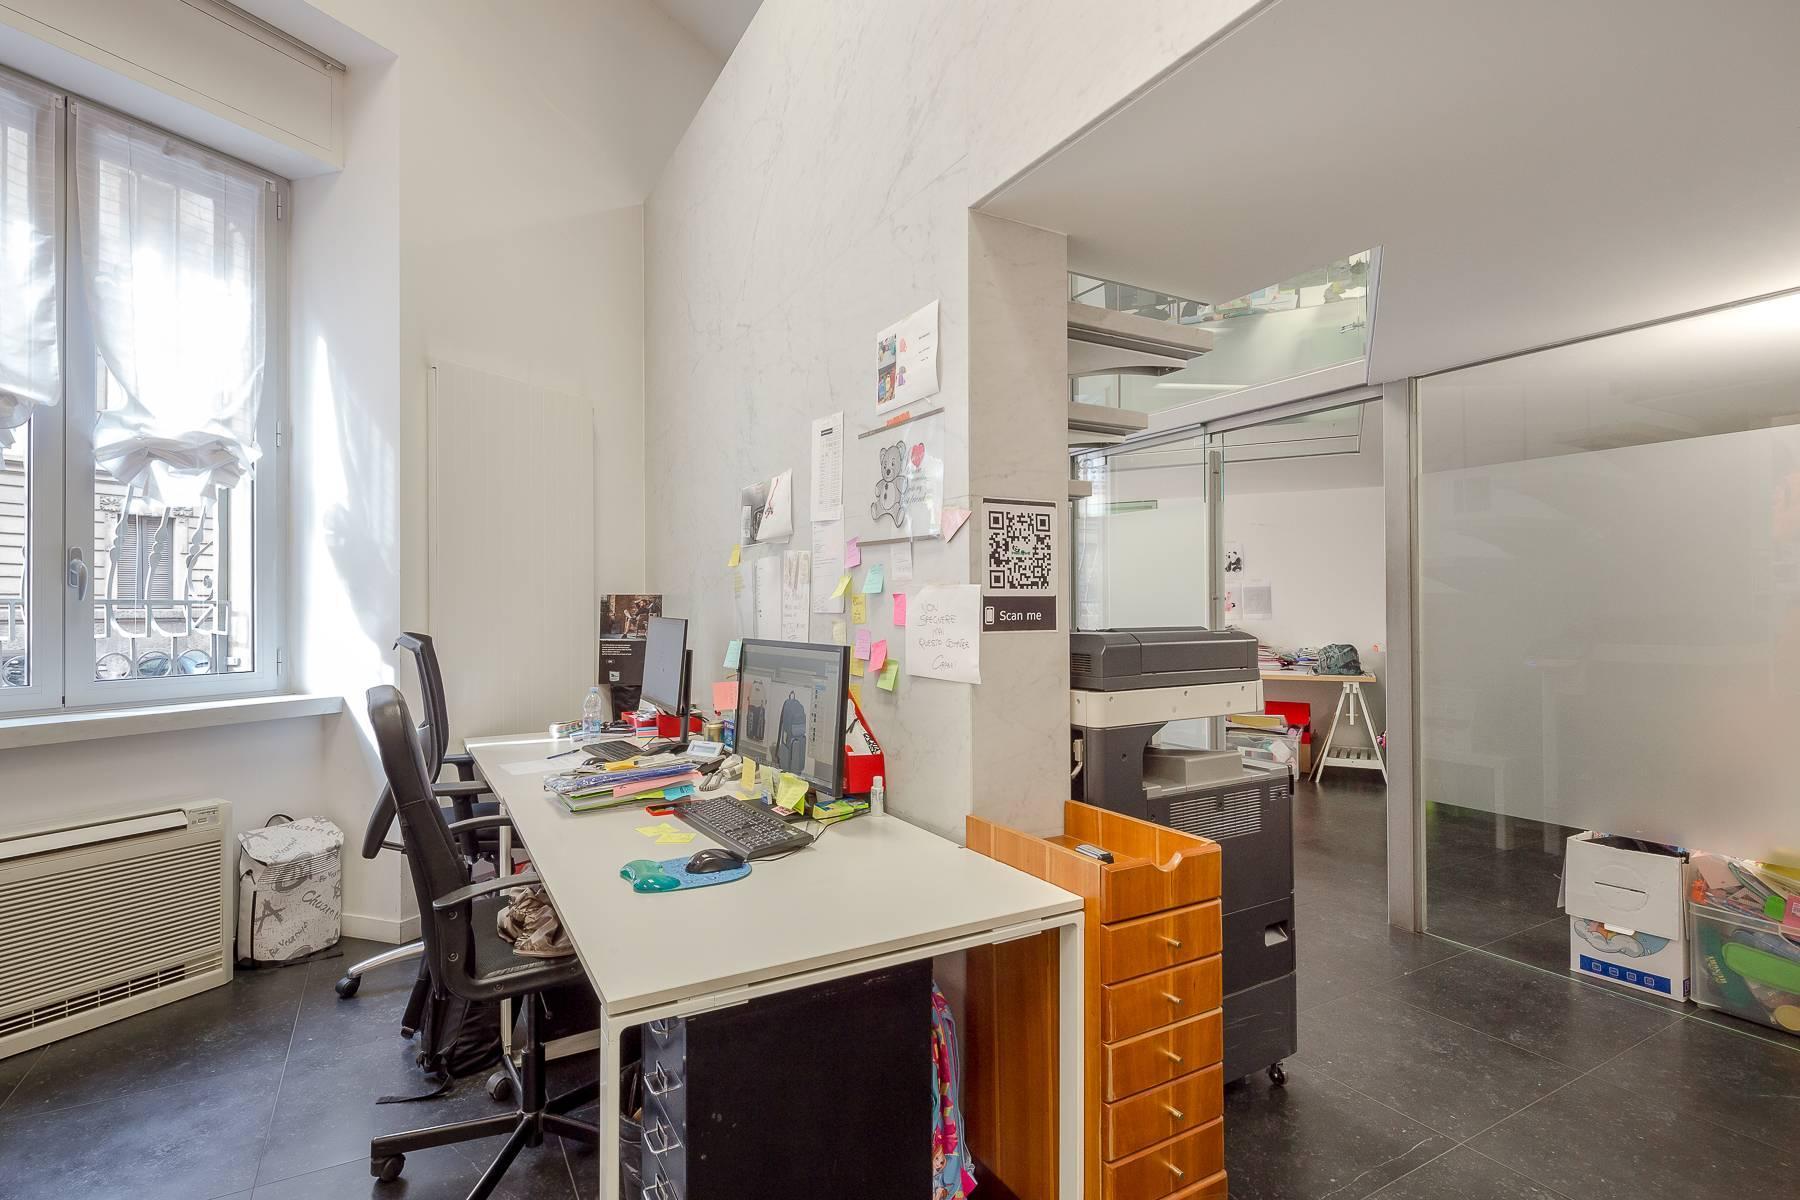 Open space office/residential property in Piazza Giovine Italia/Via Aurelio Saffi - 21